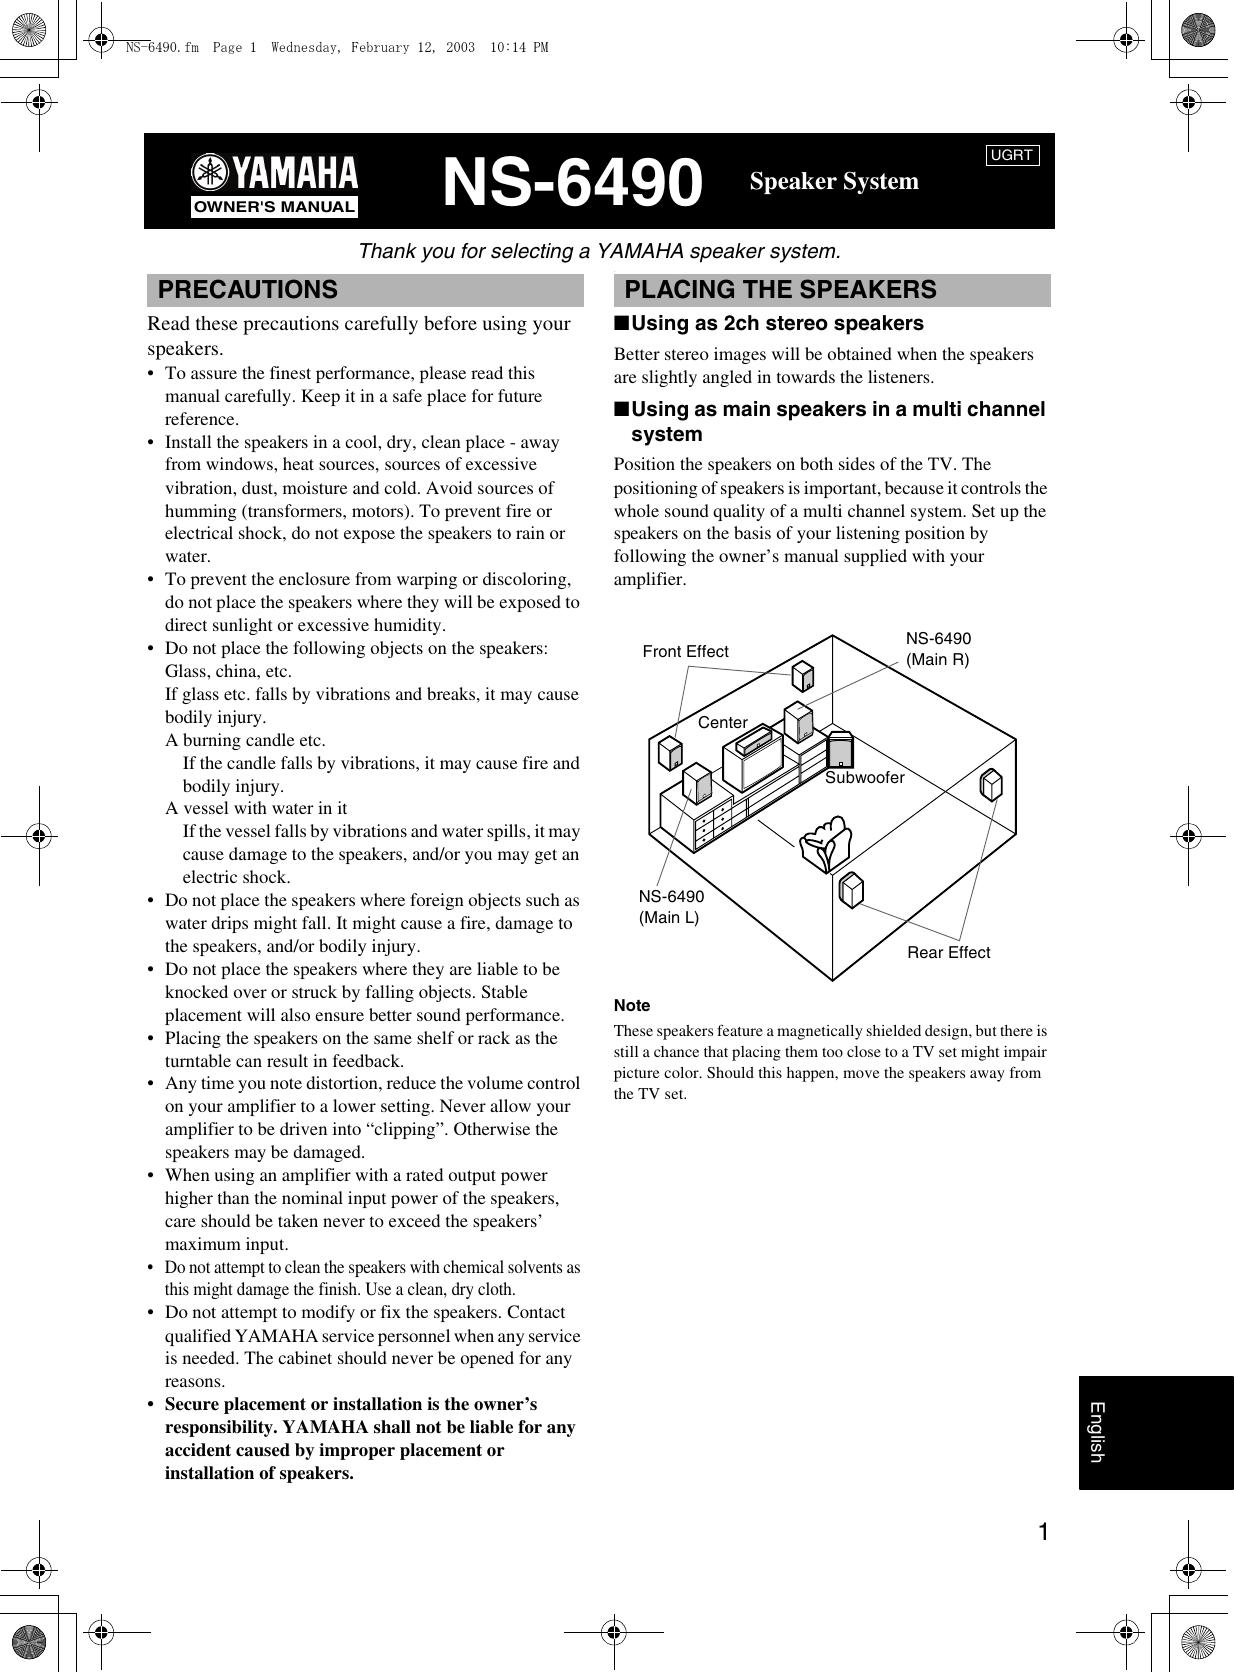 Yamaha 3 Way Bookshelf Speakers Ns6490 Pr Users Manual NS 6490